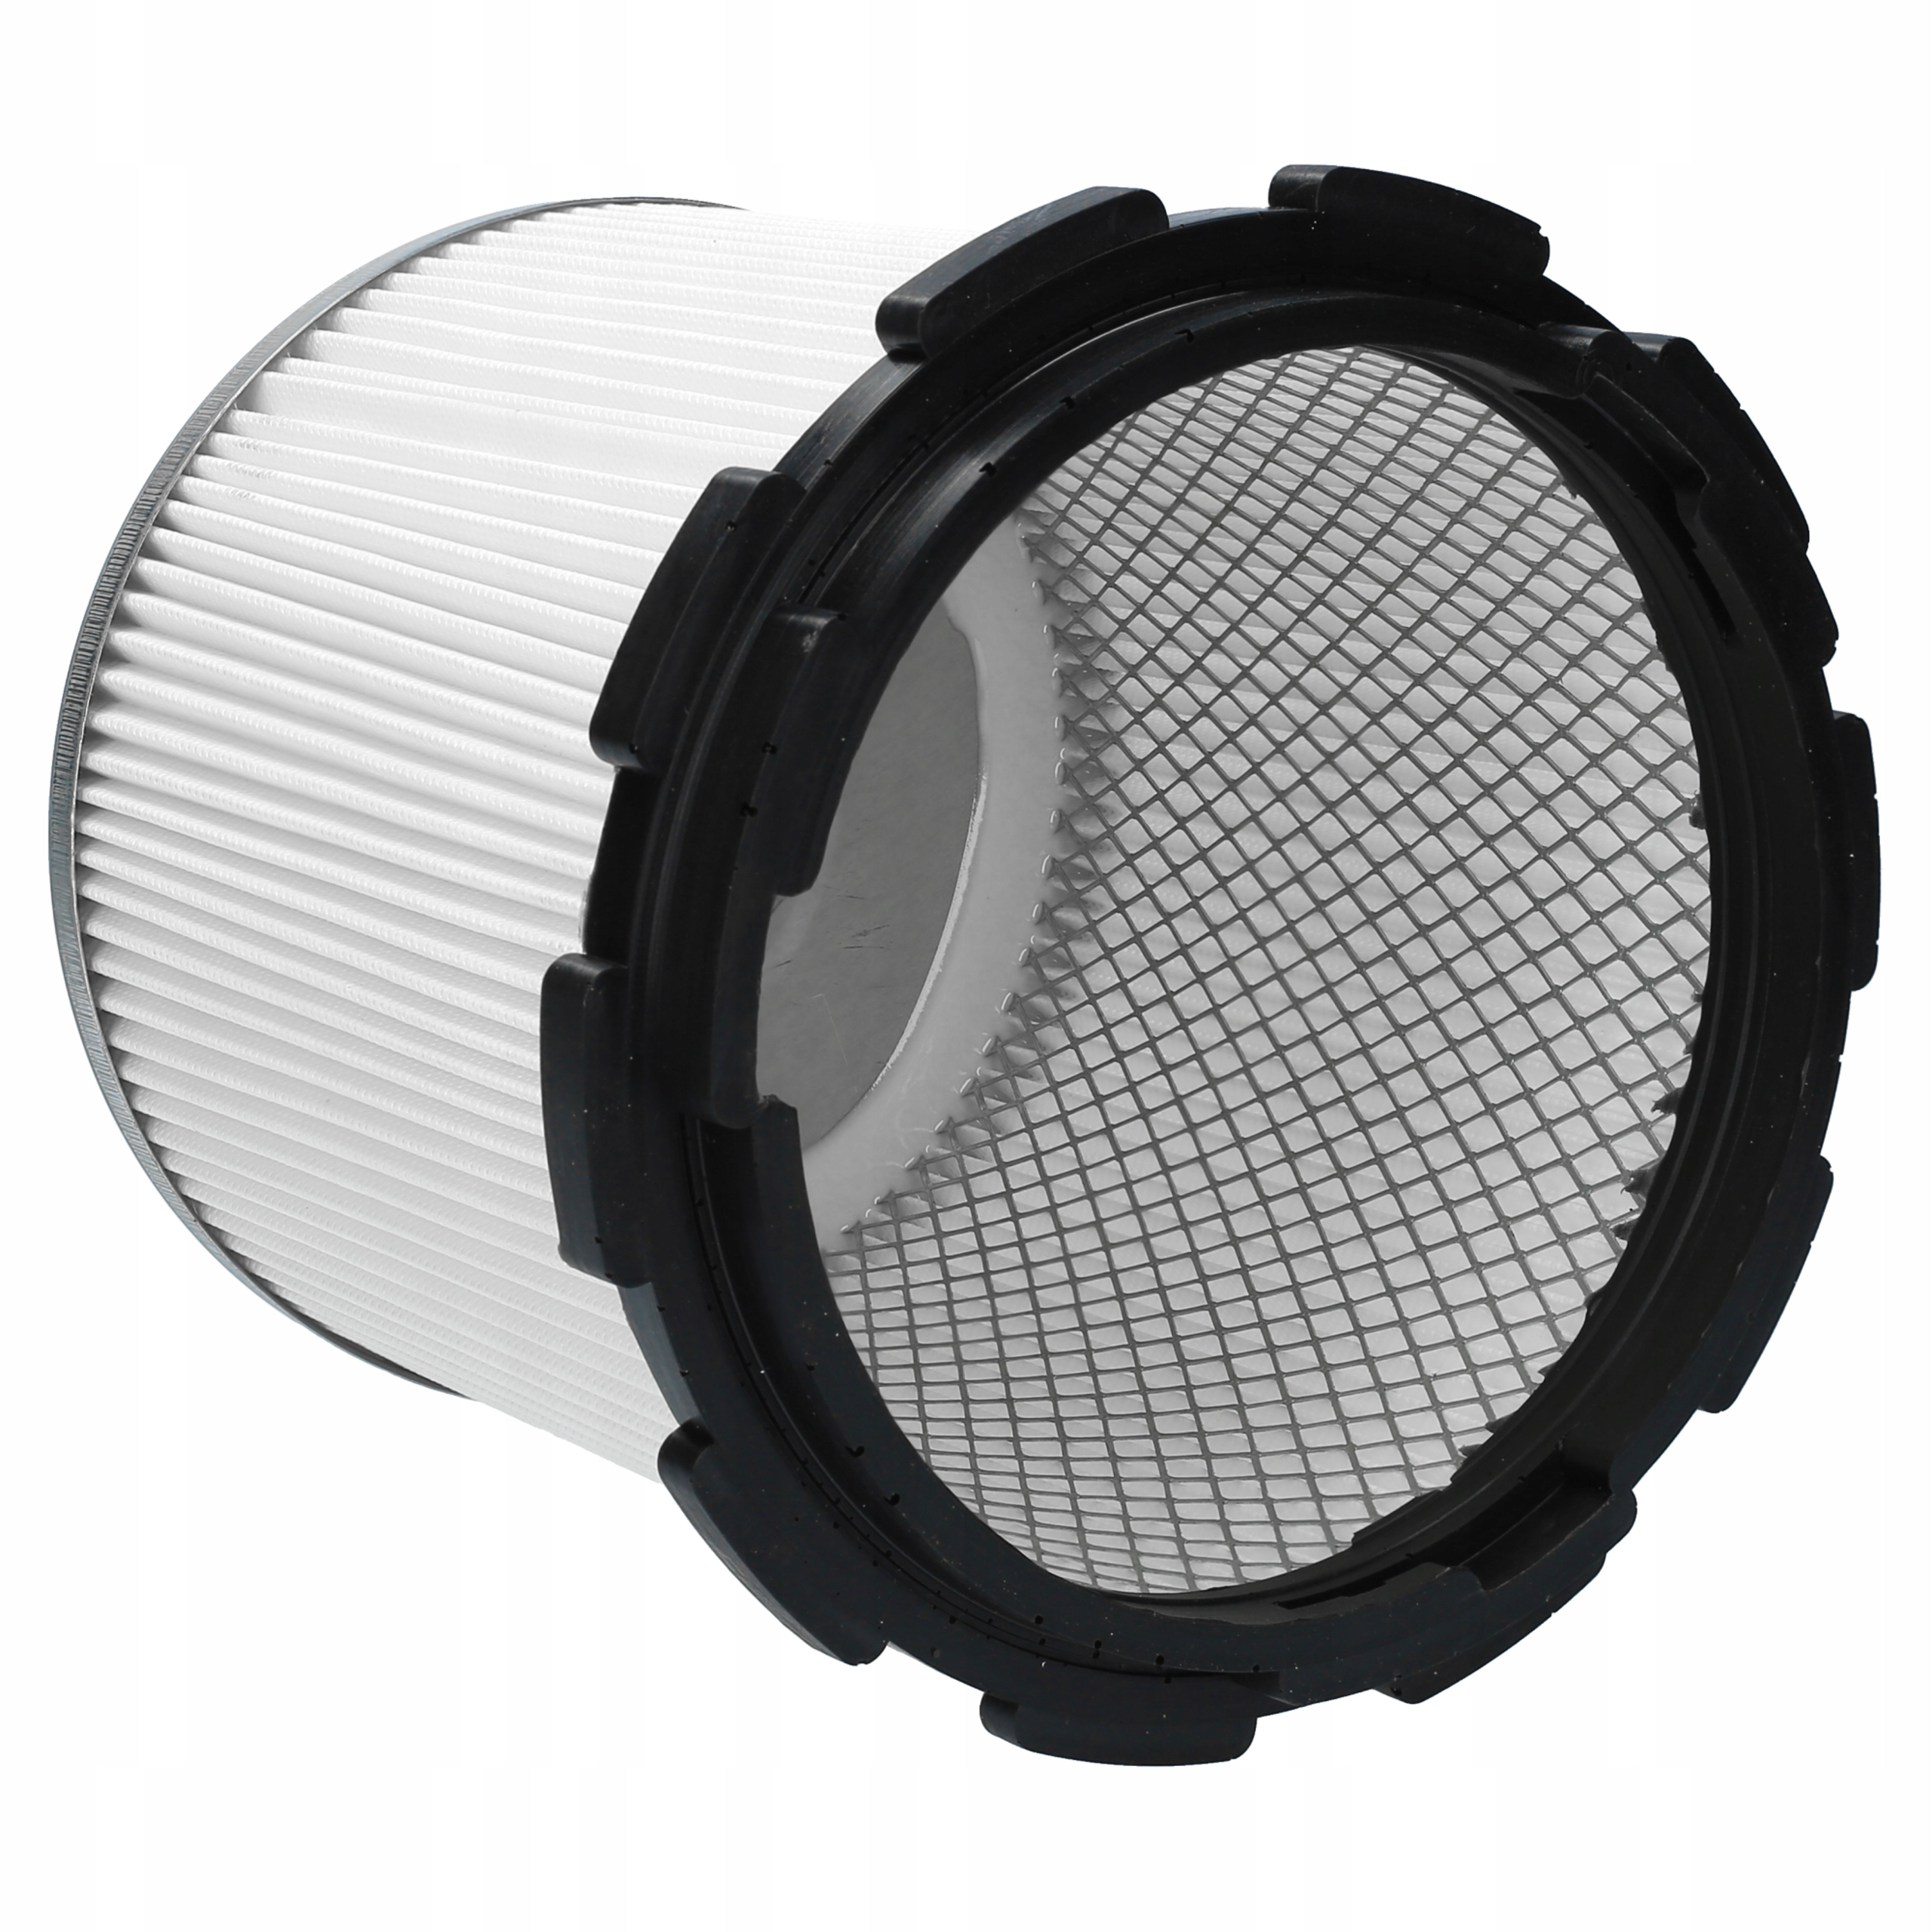 Filter do vysávača PROTOOL VCP 30 E, KRESS NTS